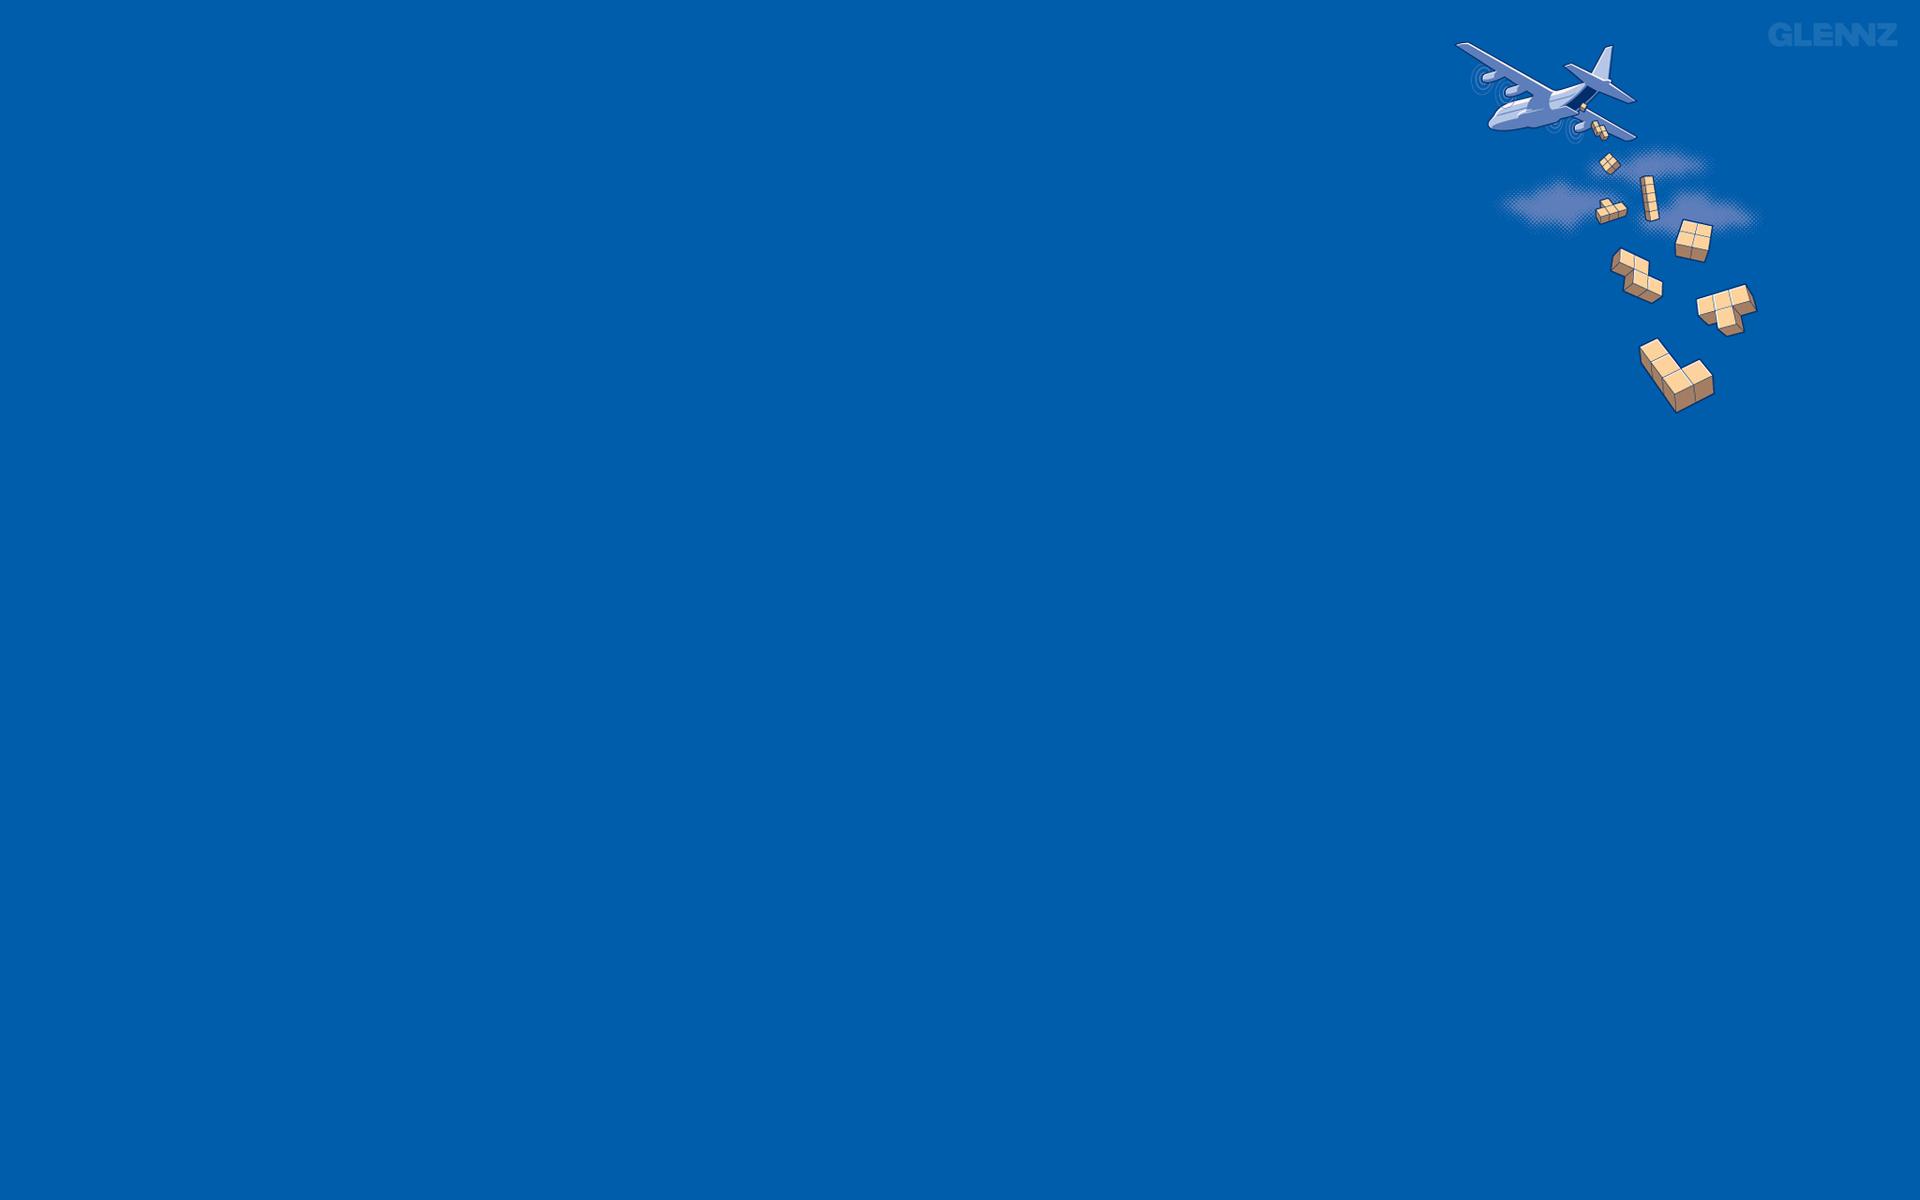 Airdrop Solid Wallpaper 1920x1200 Colors Continued